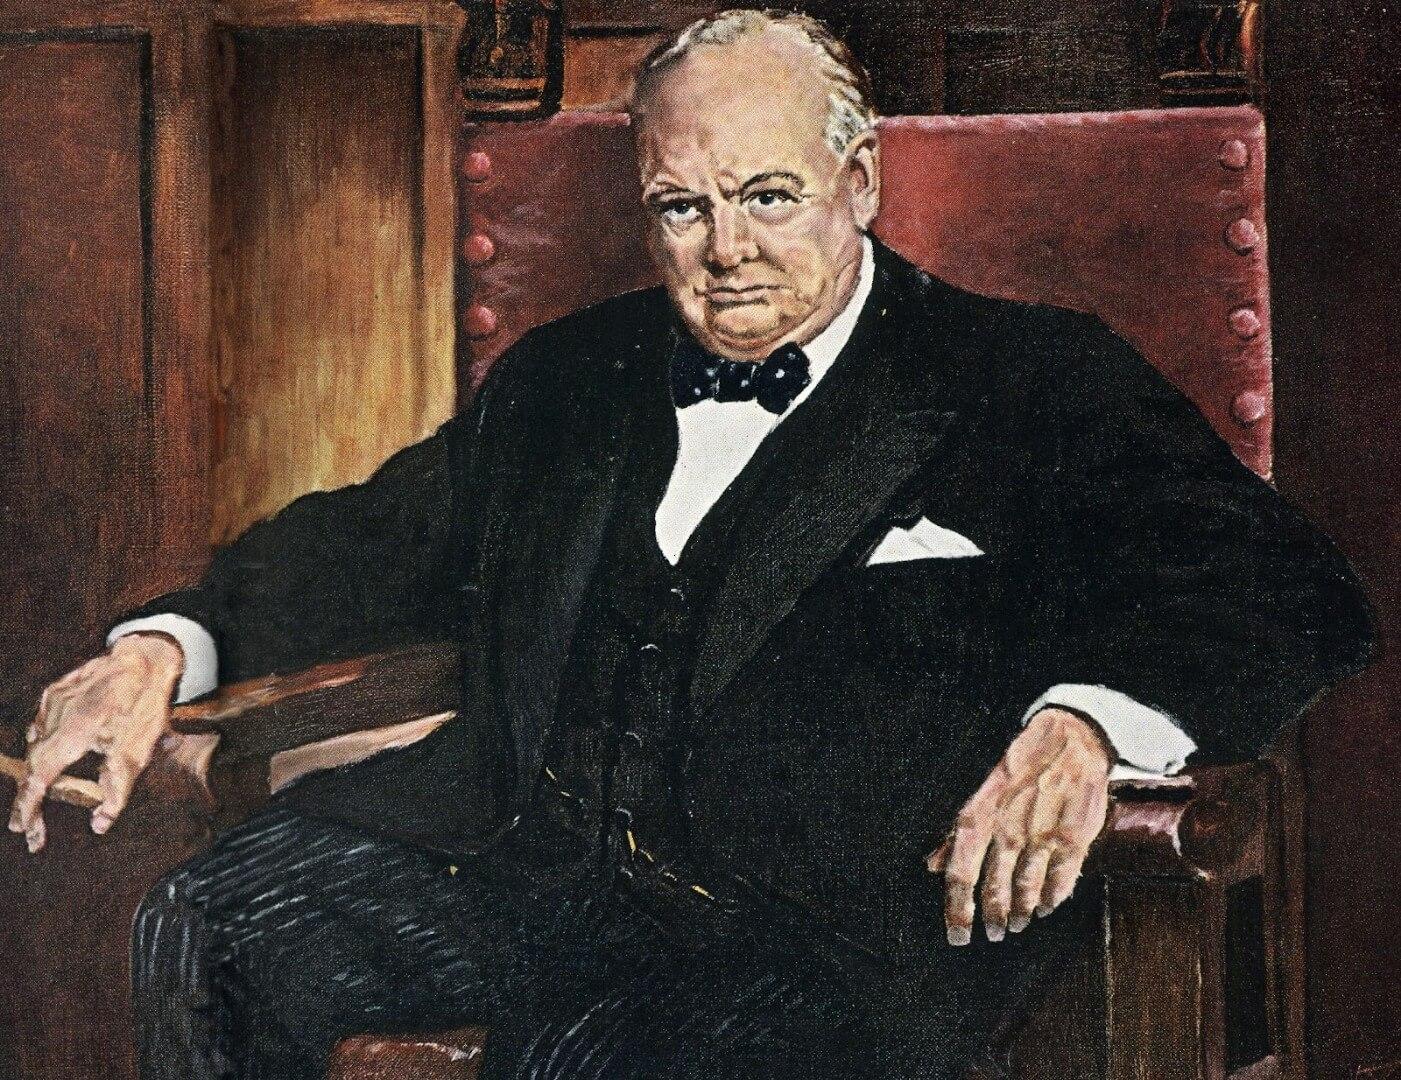 Eisenhower painting of churchill